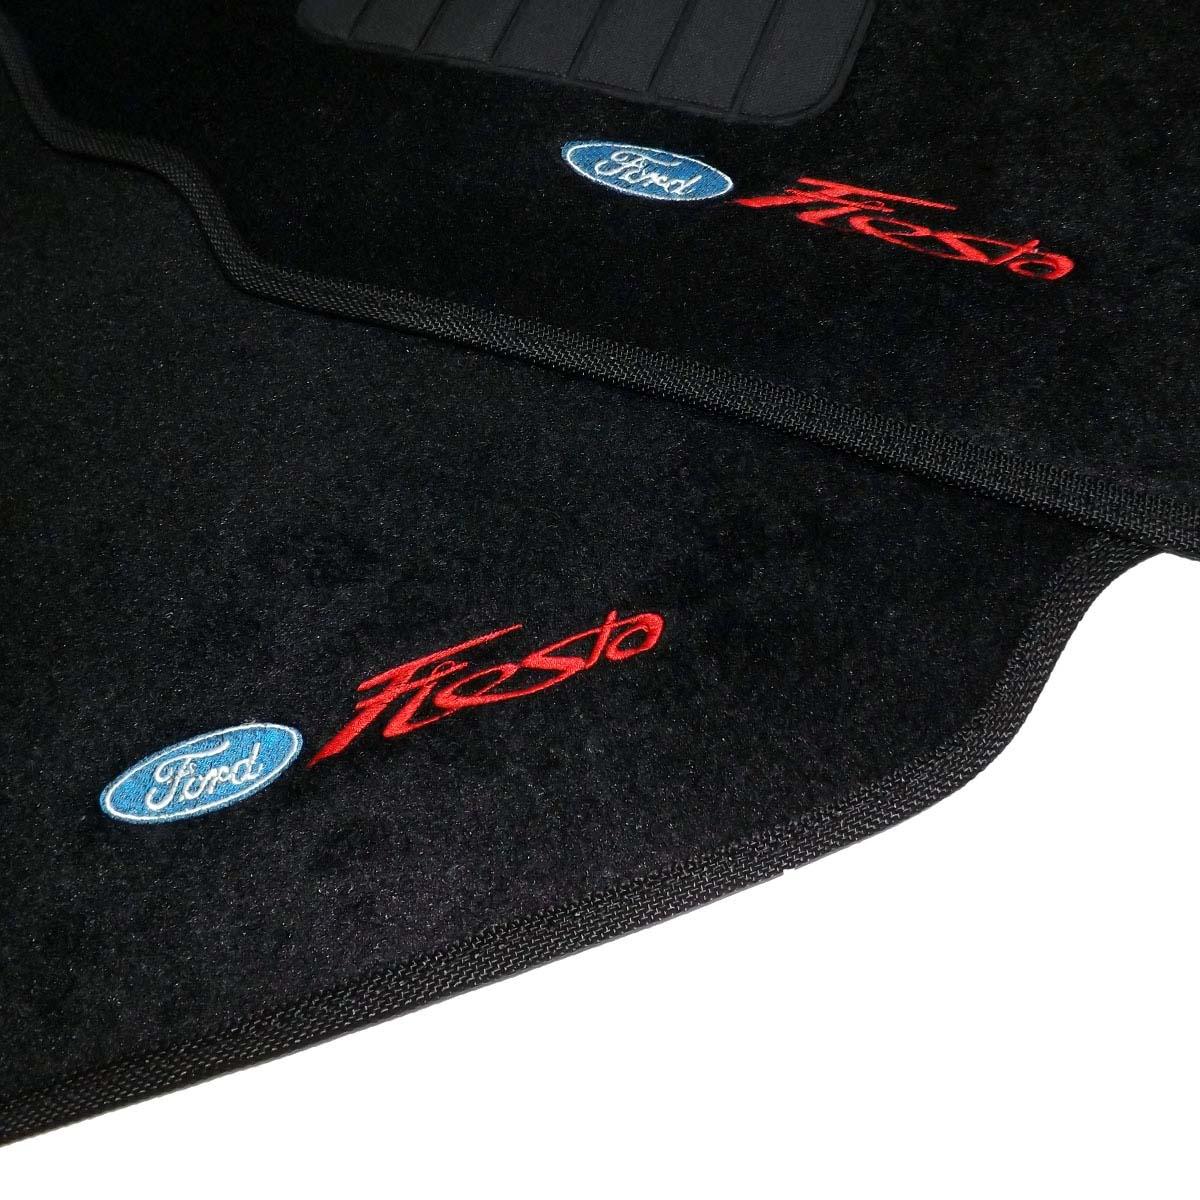 Tapete Carpete Personalizado Logo Bordada Fiesta 1996 até 2002